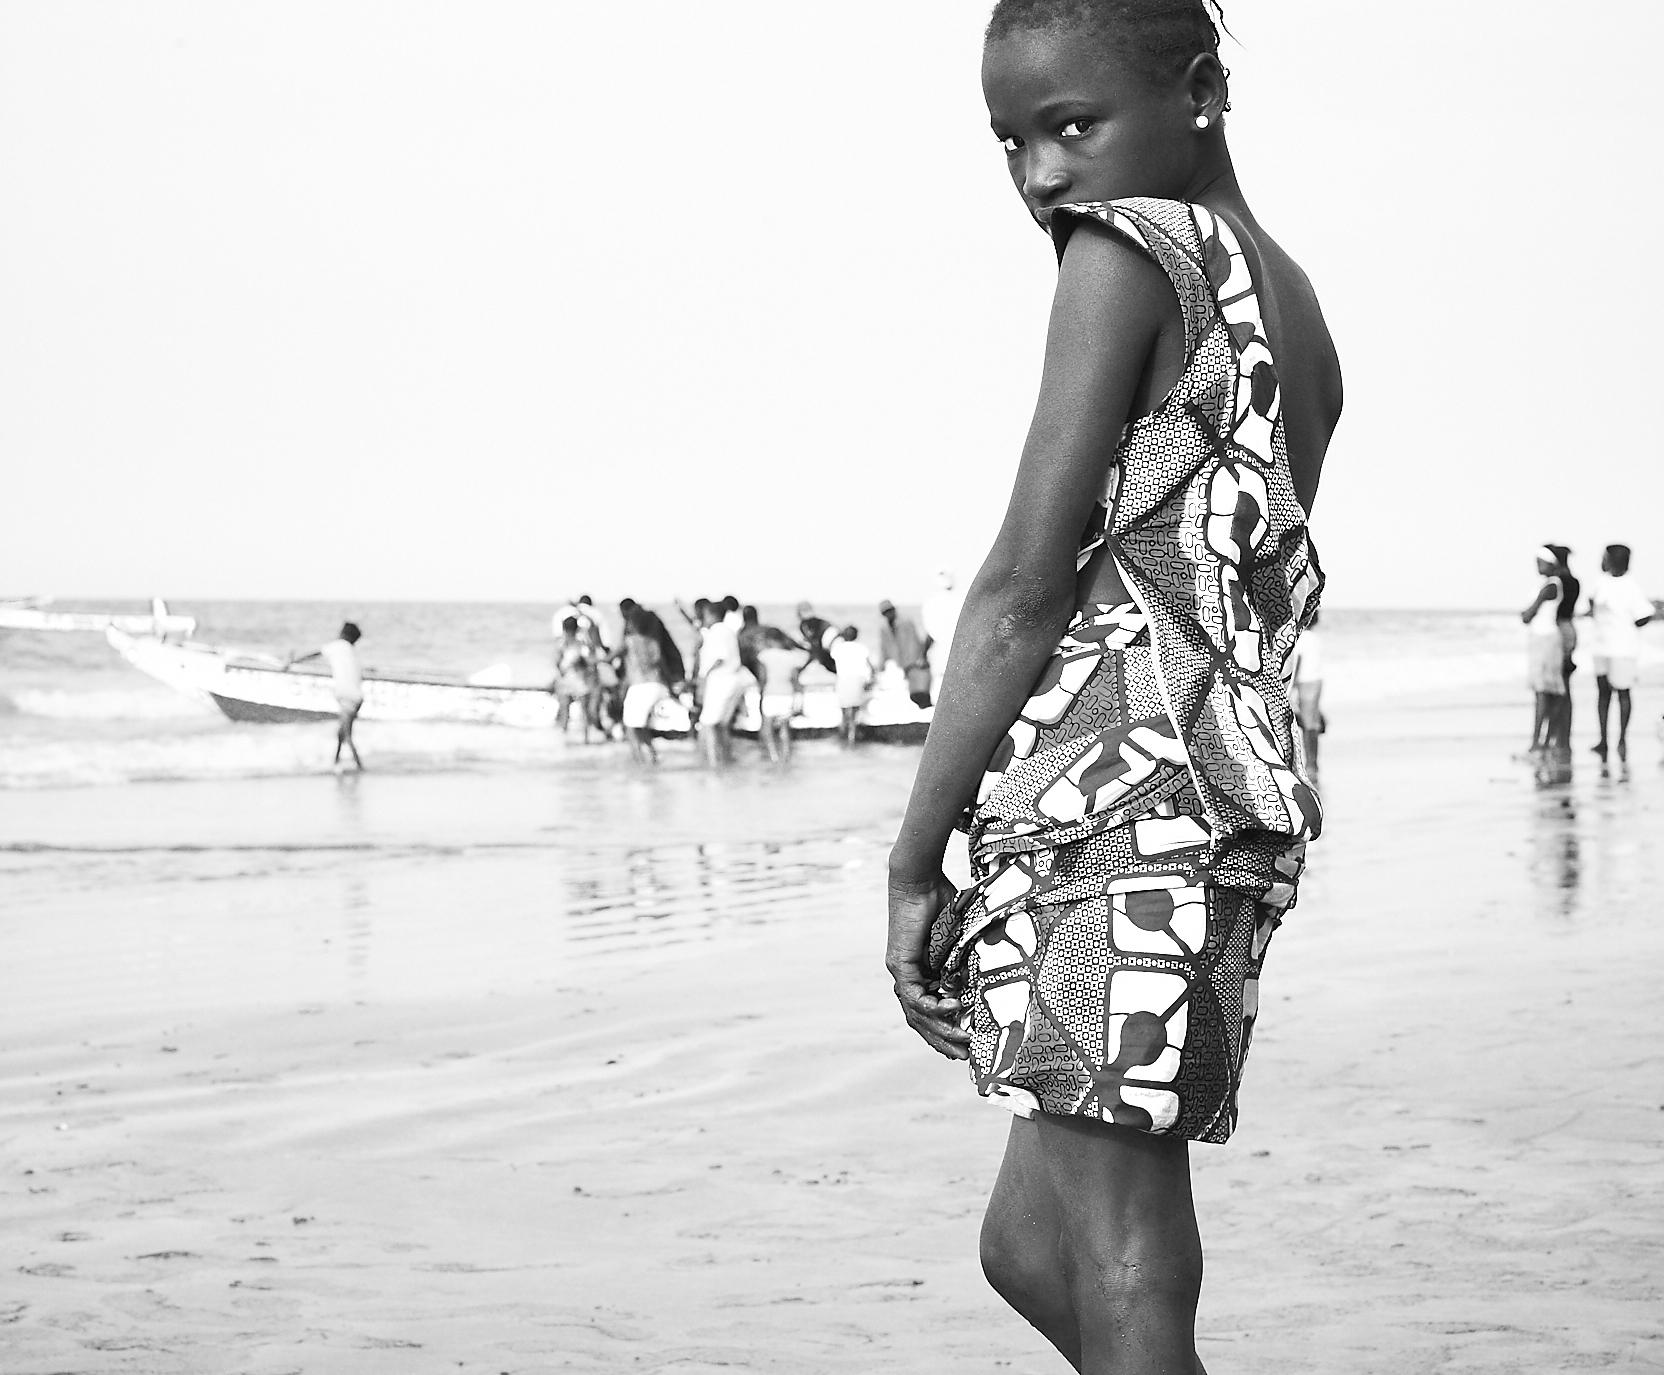 Gambia-006302.jpg